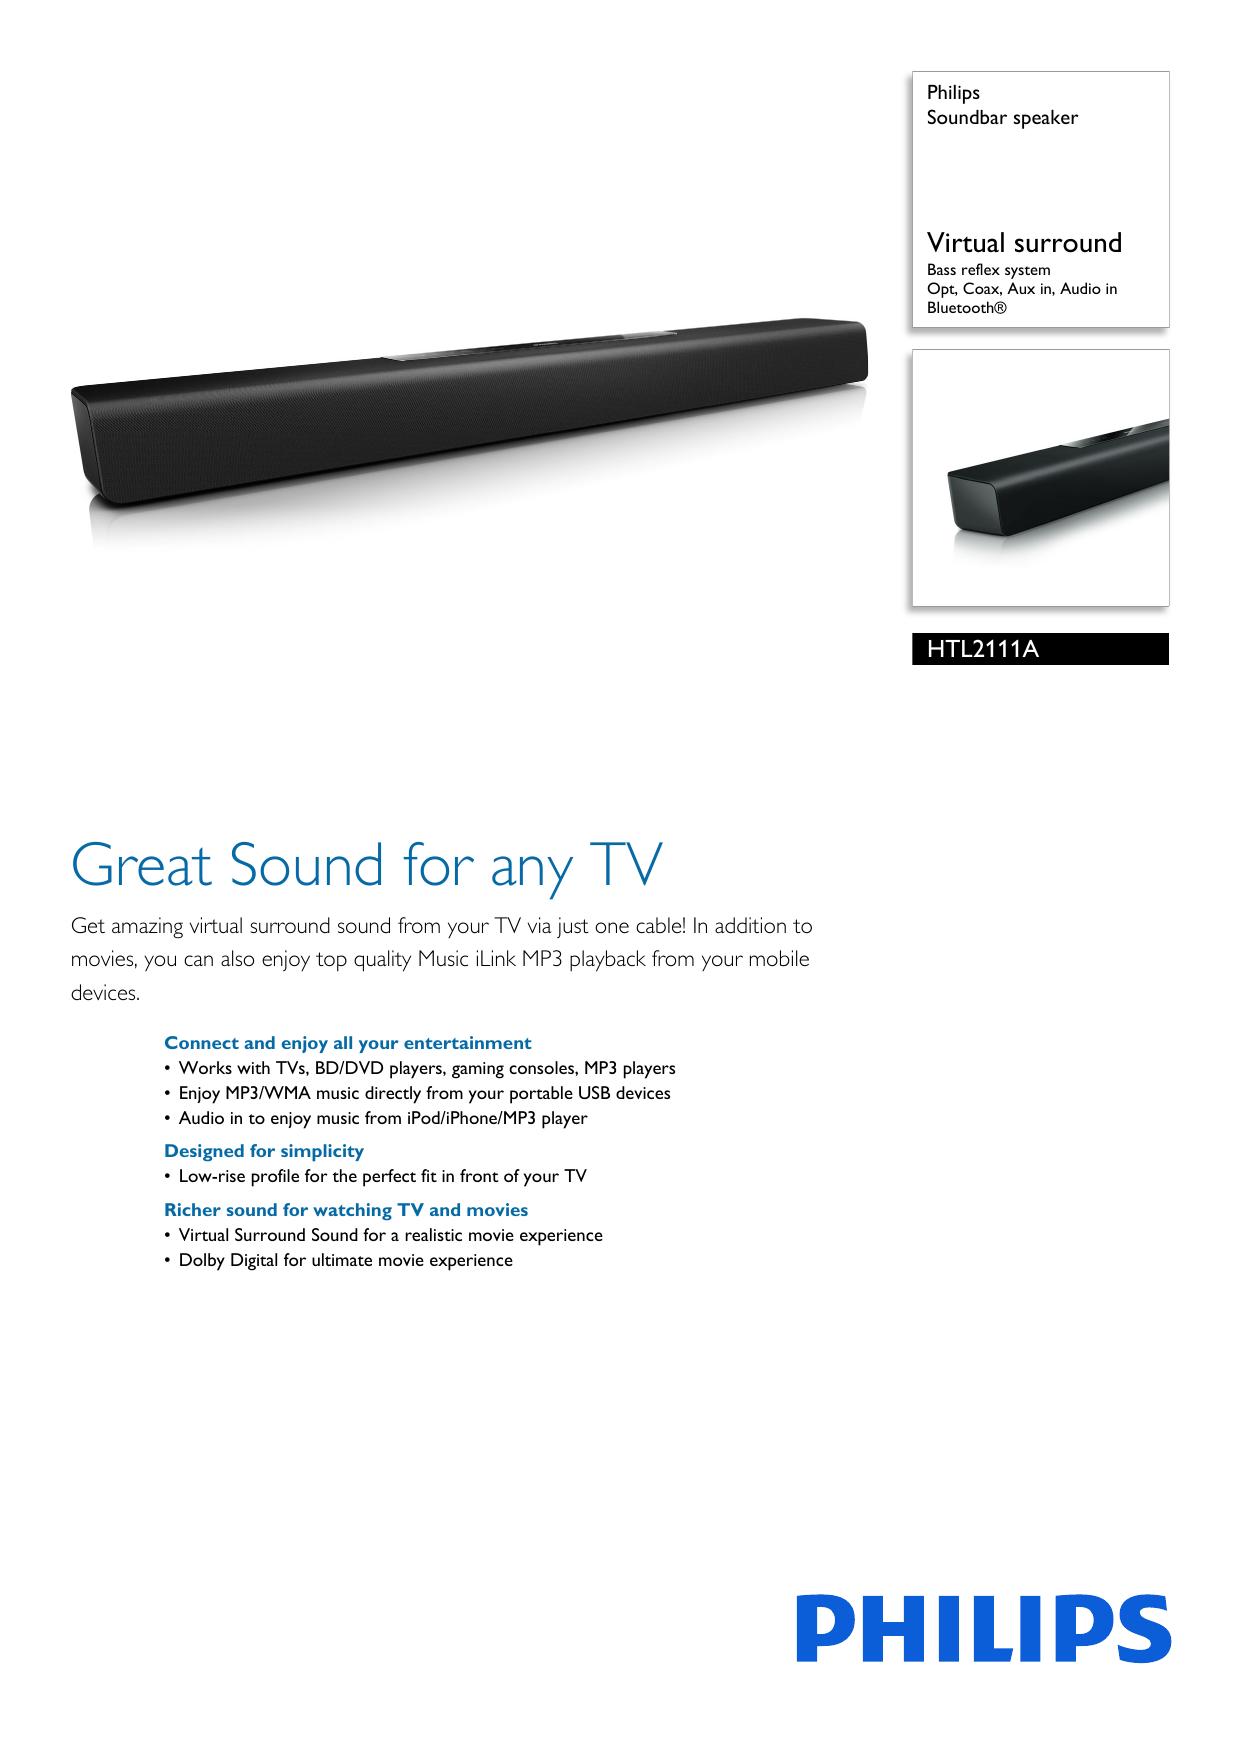 HTL2111A/F7 Philips Soundbar speaker | manualzz com